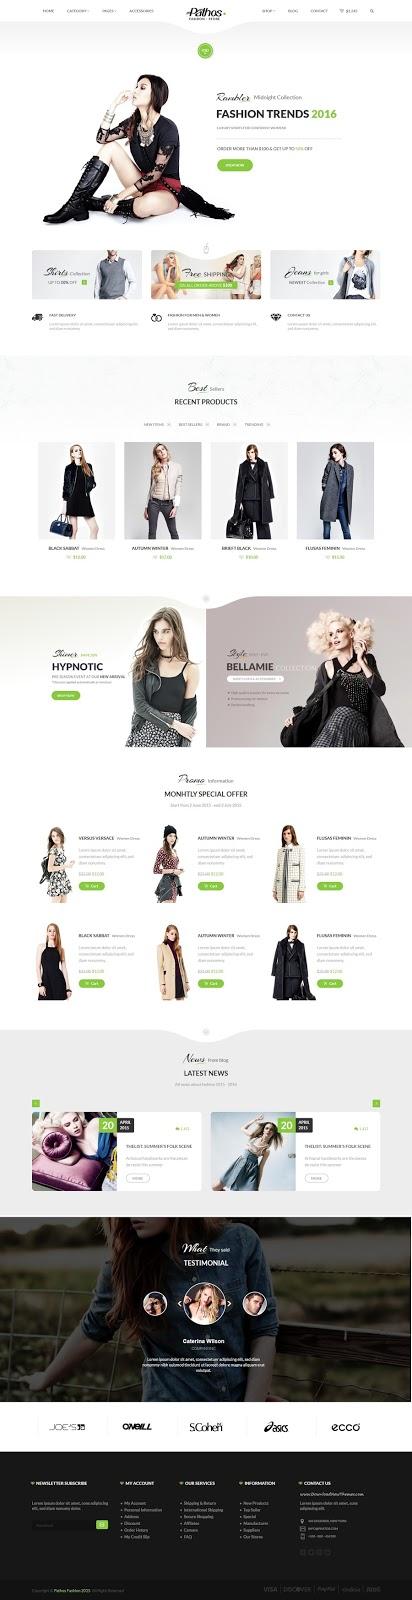 Pathos eCommerce responsive html template